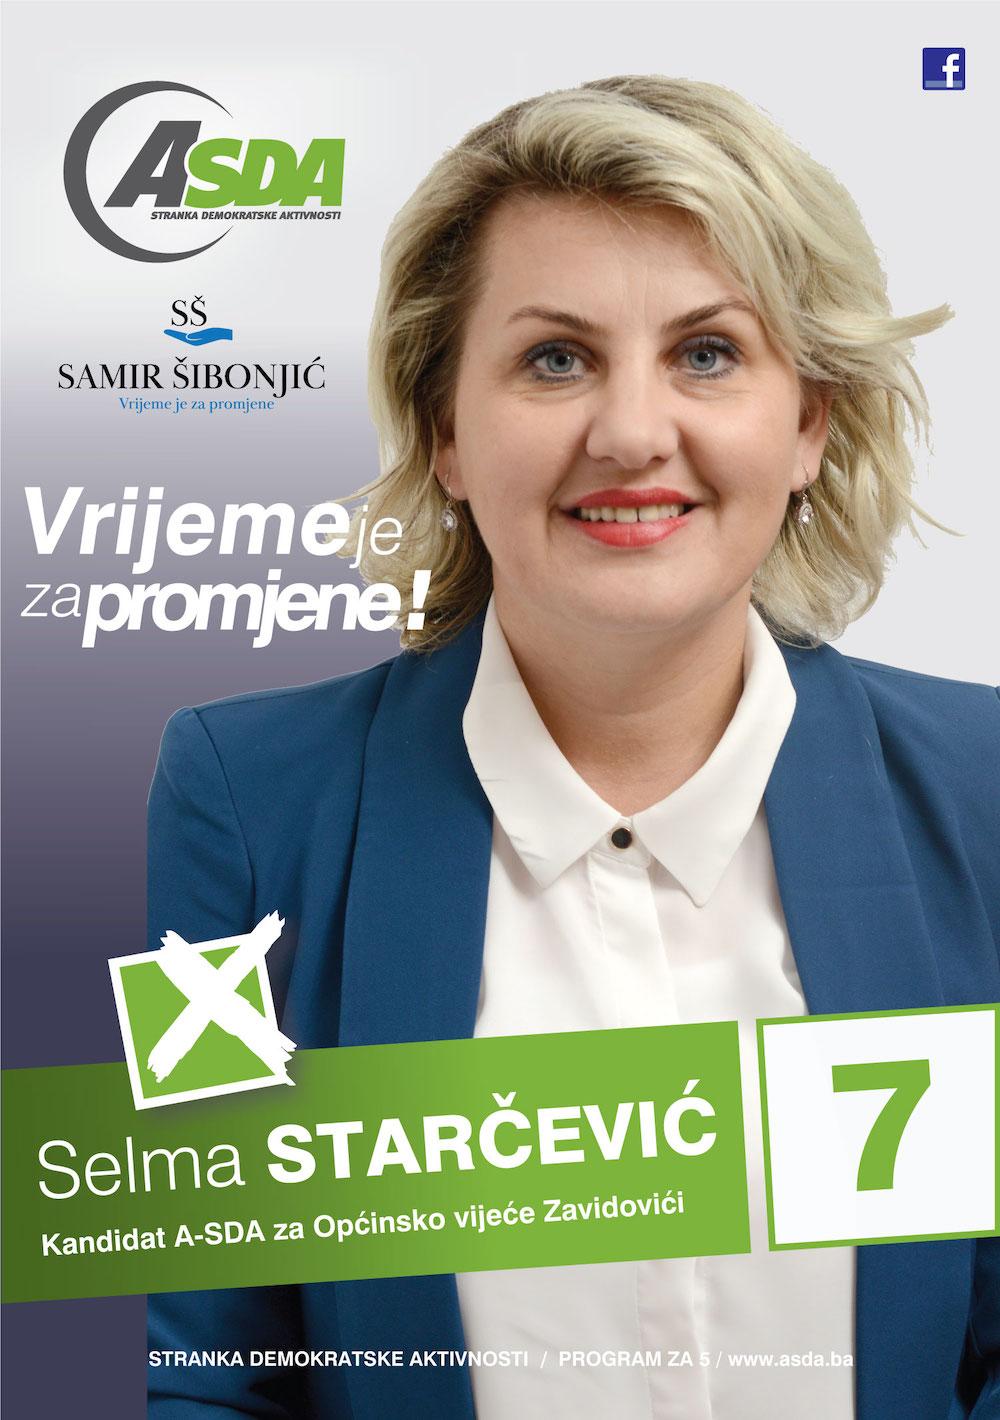 Selma Starčević